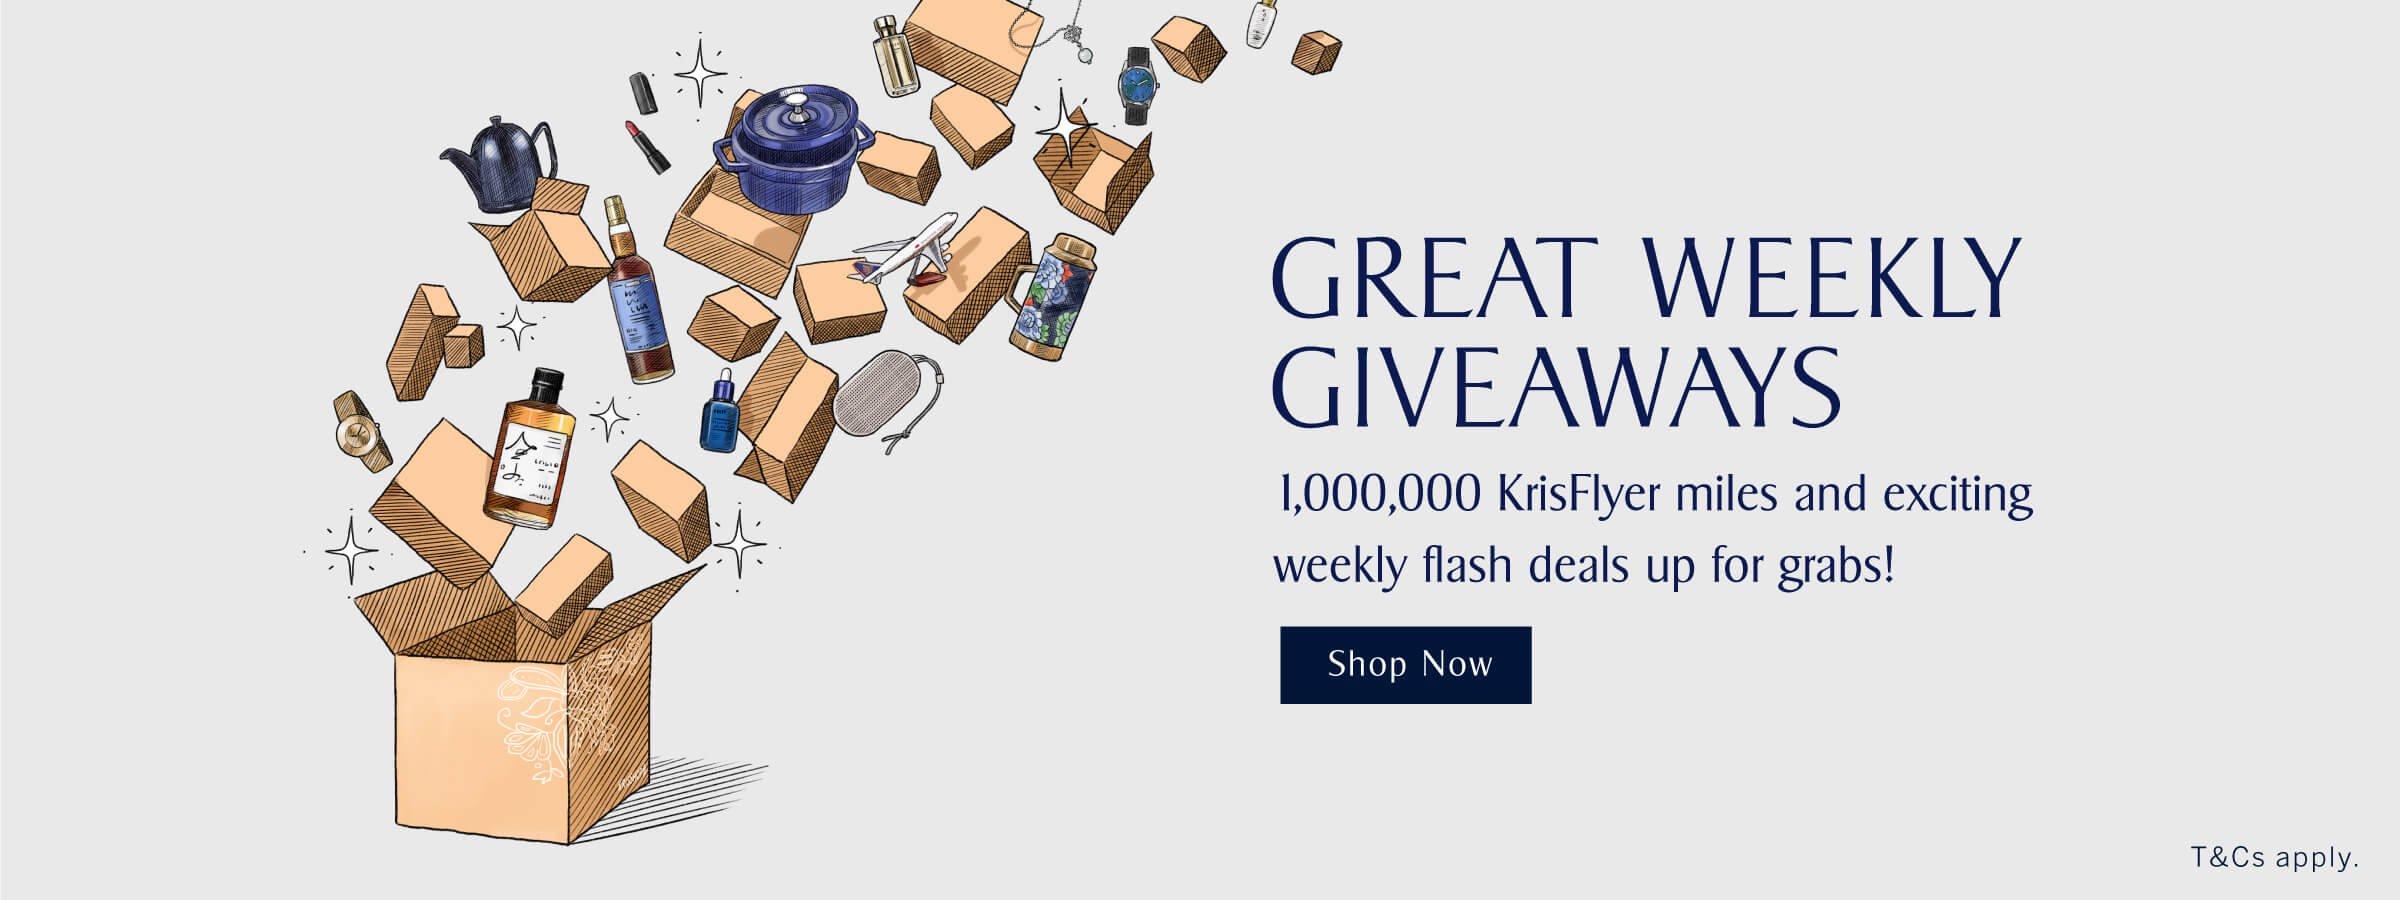 KrisShop Great Weekly Giveaways